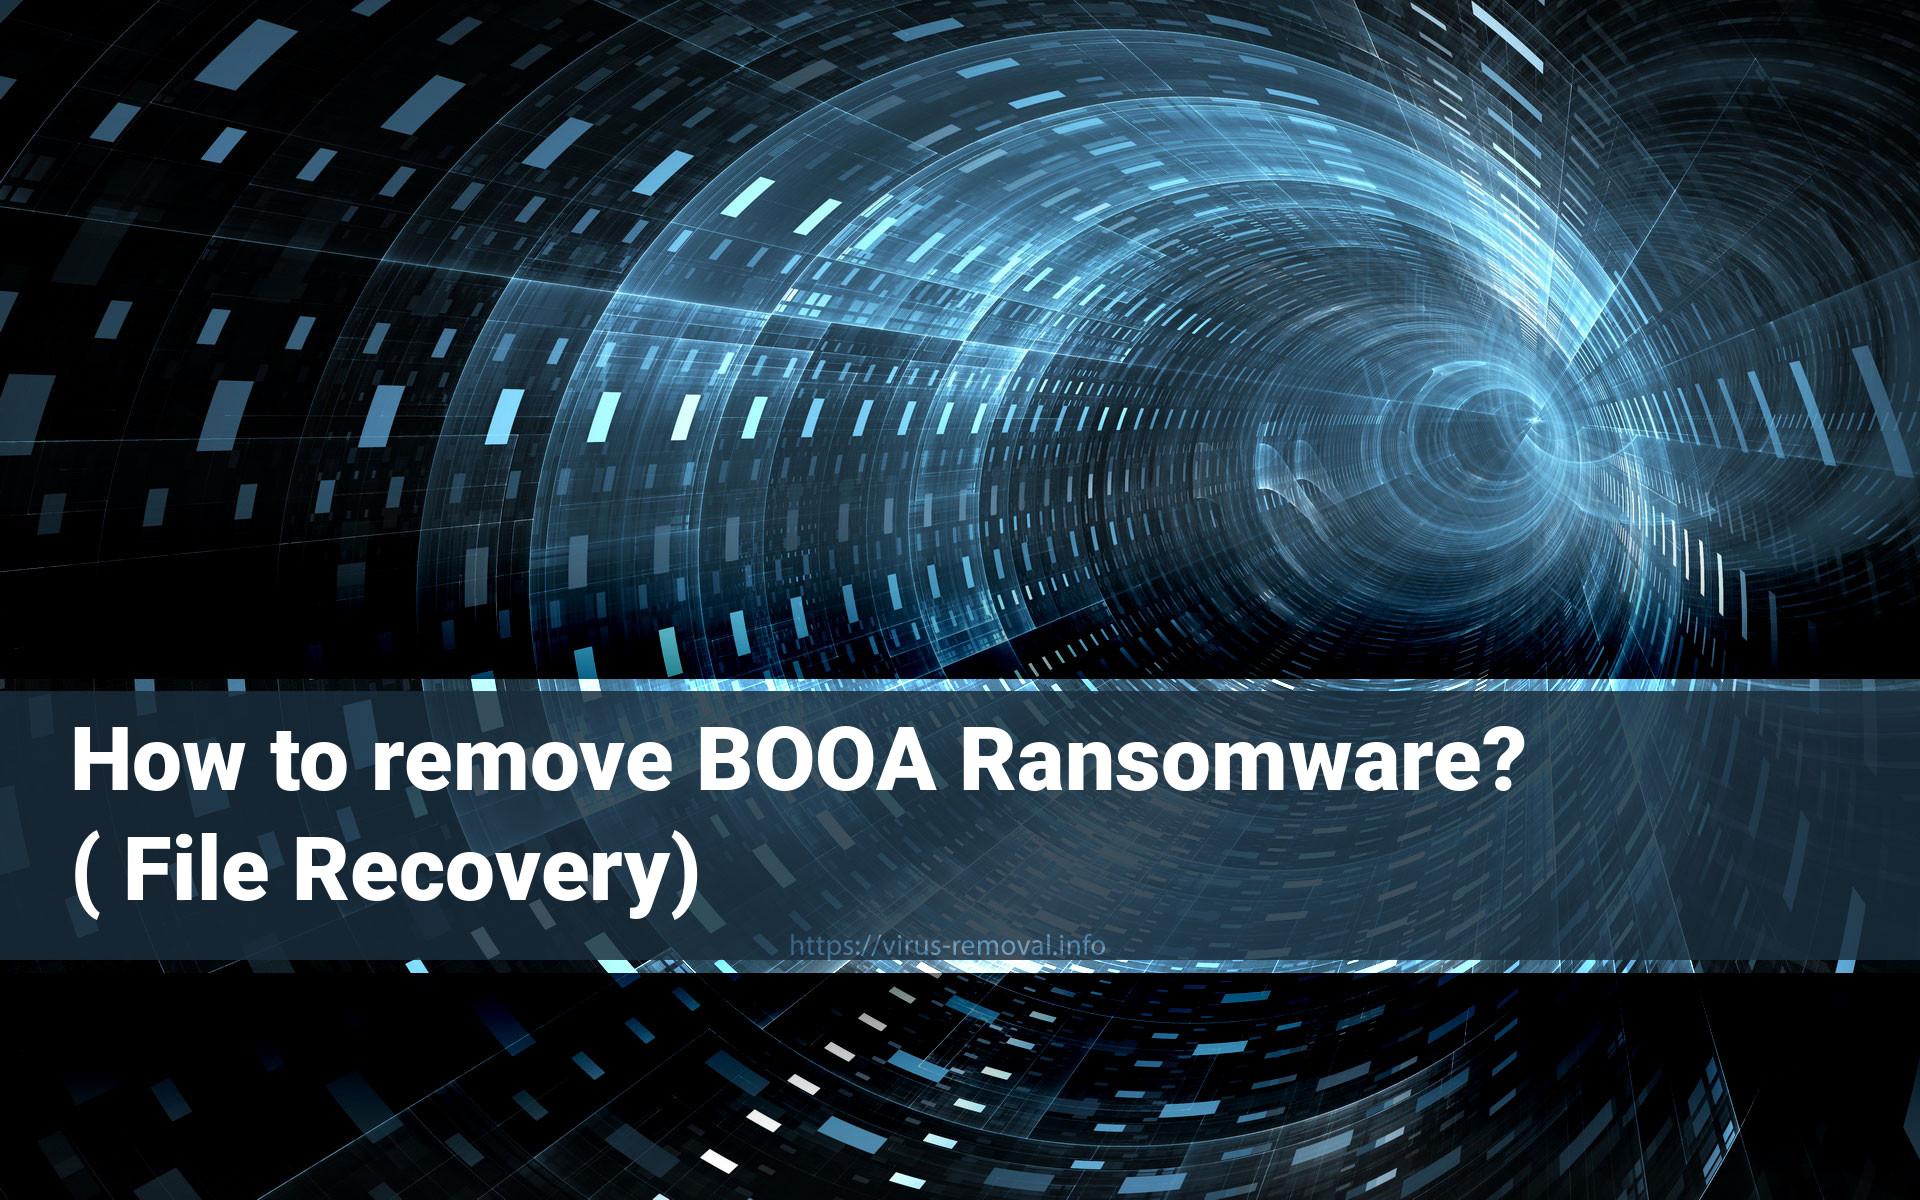 Booa Ransomware